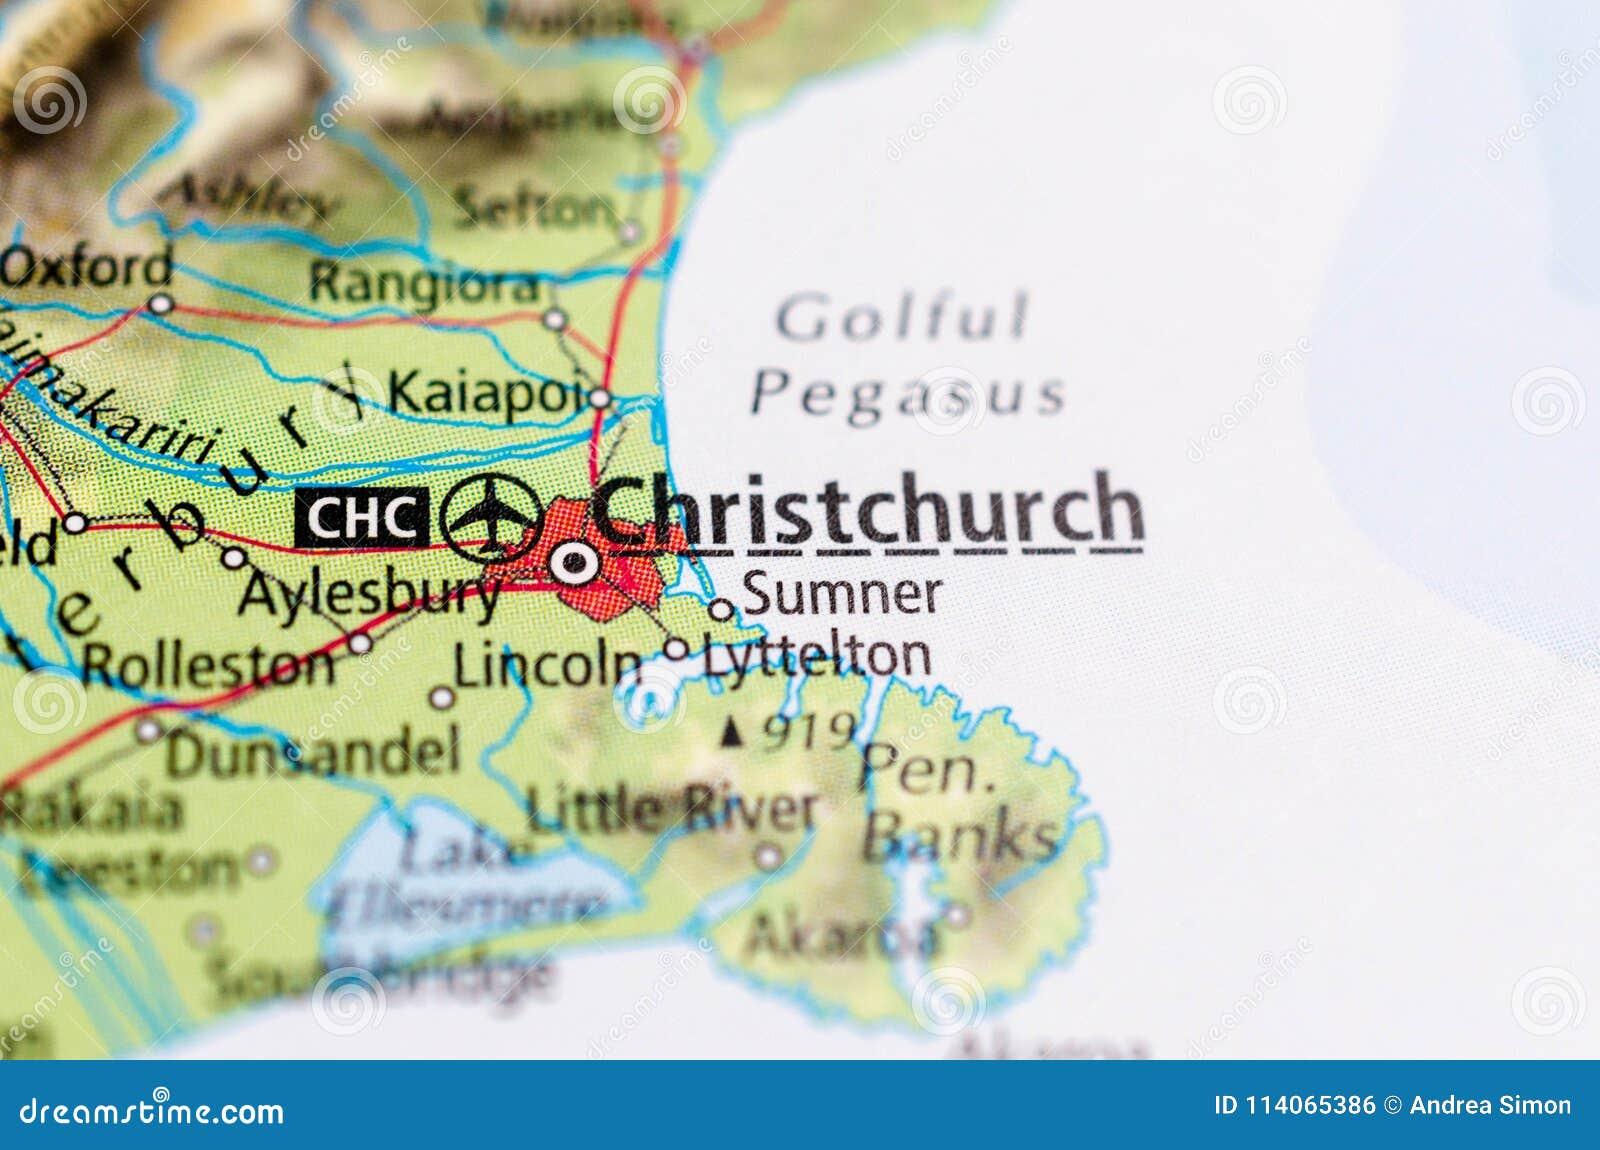 Christchurch Map on